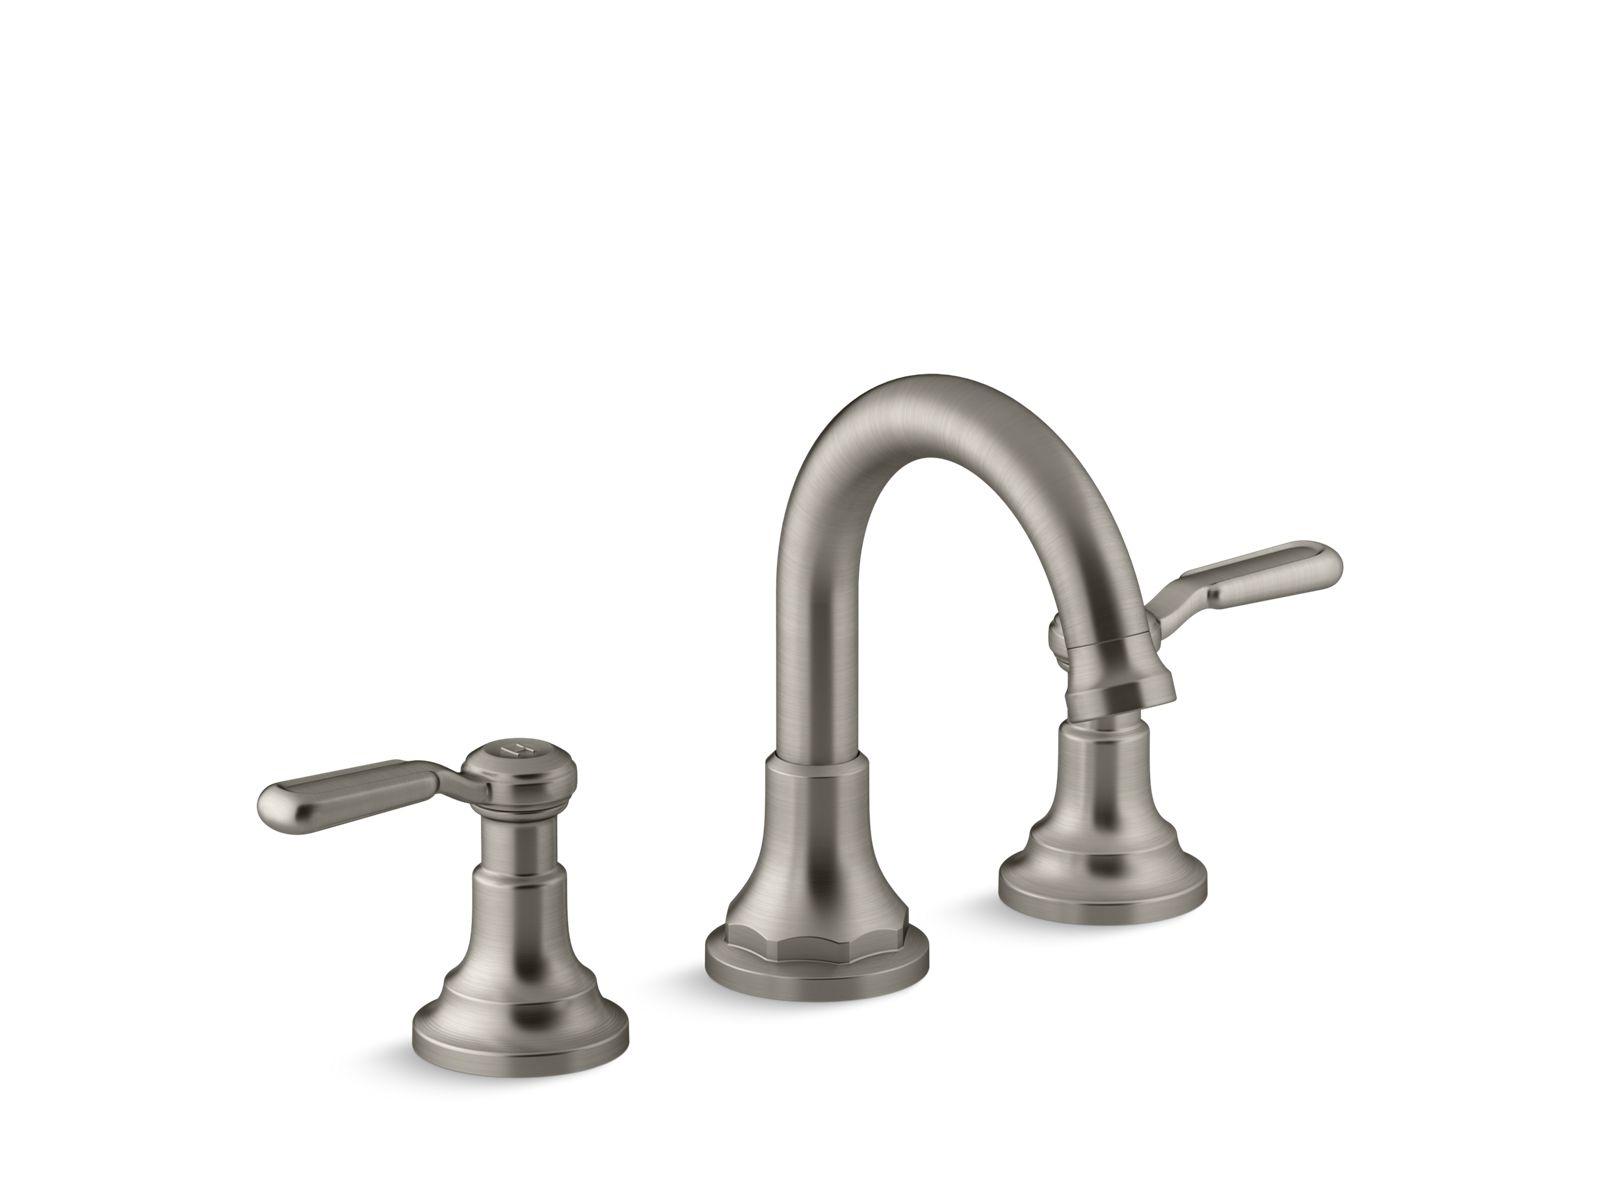 k r76257 4d worth widespread bathroom faucet kohler